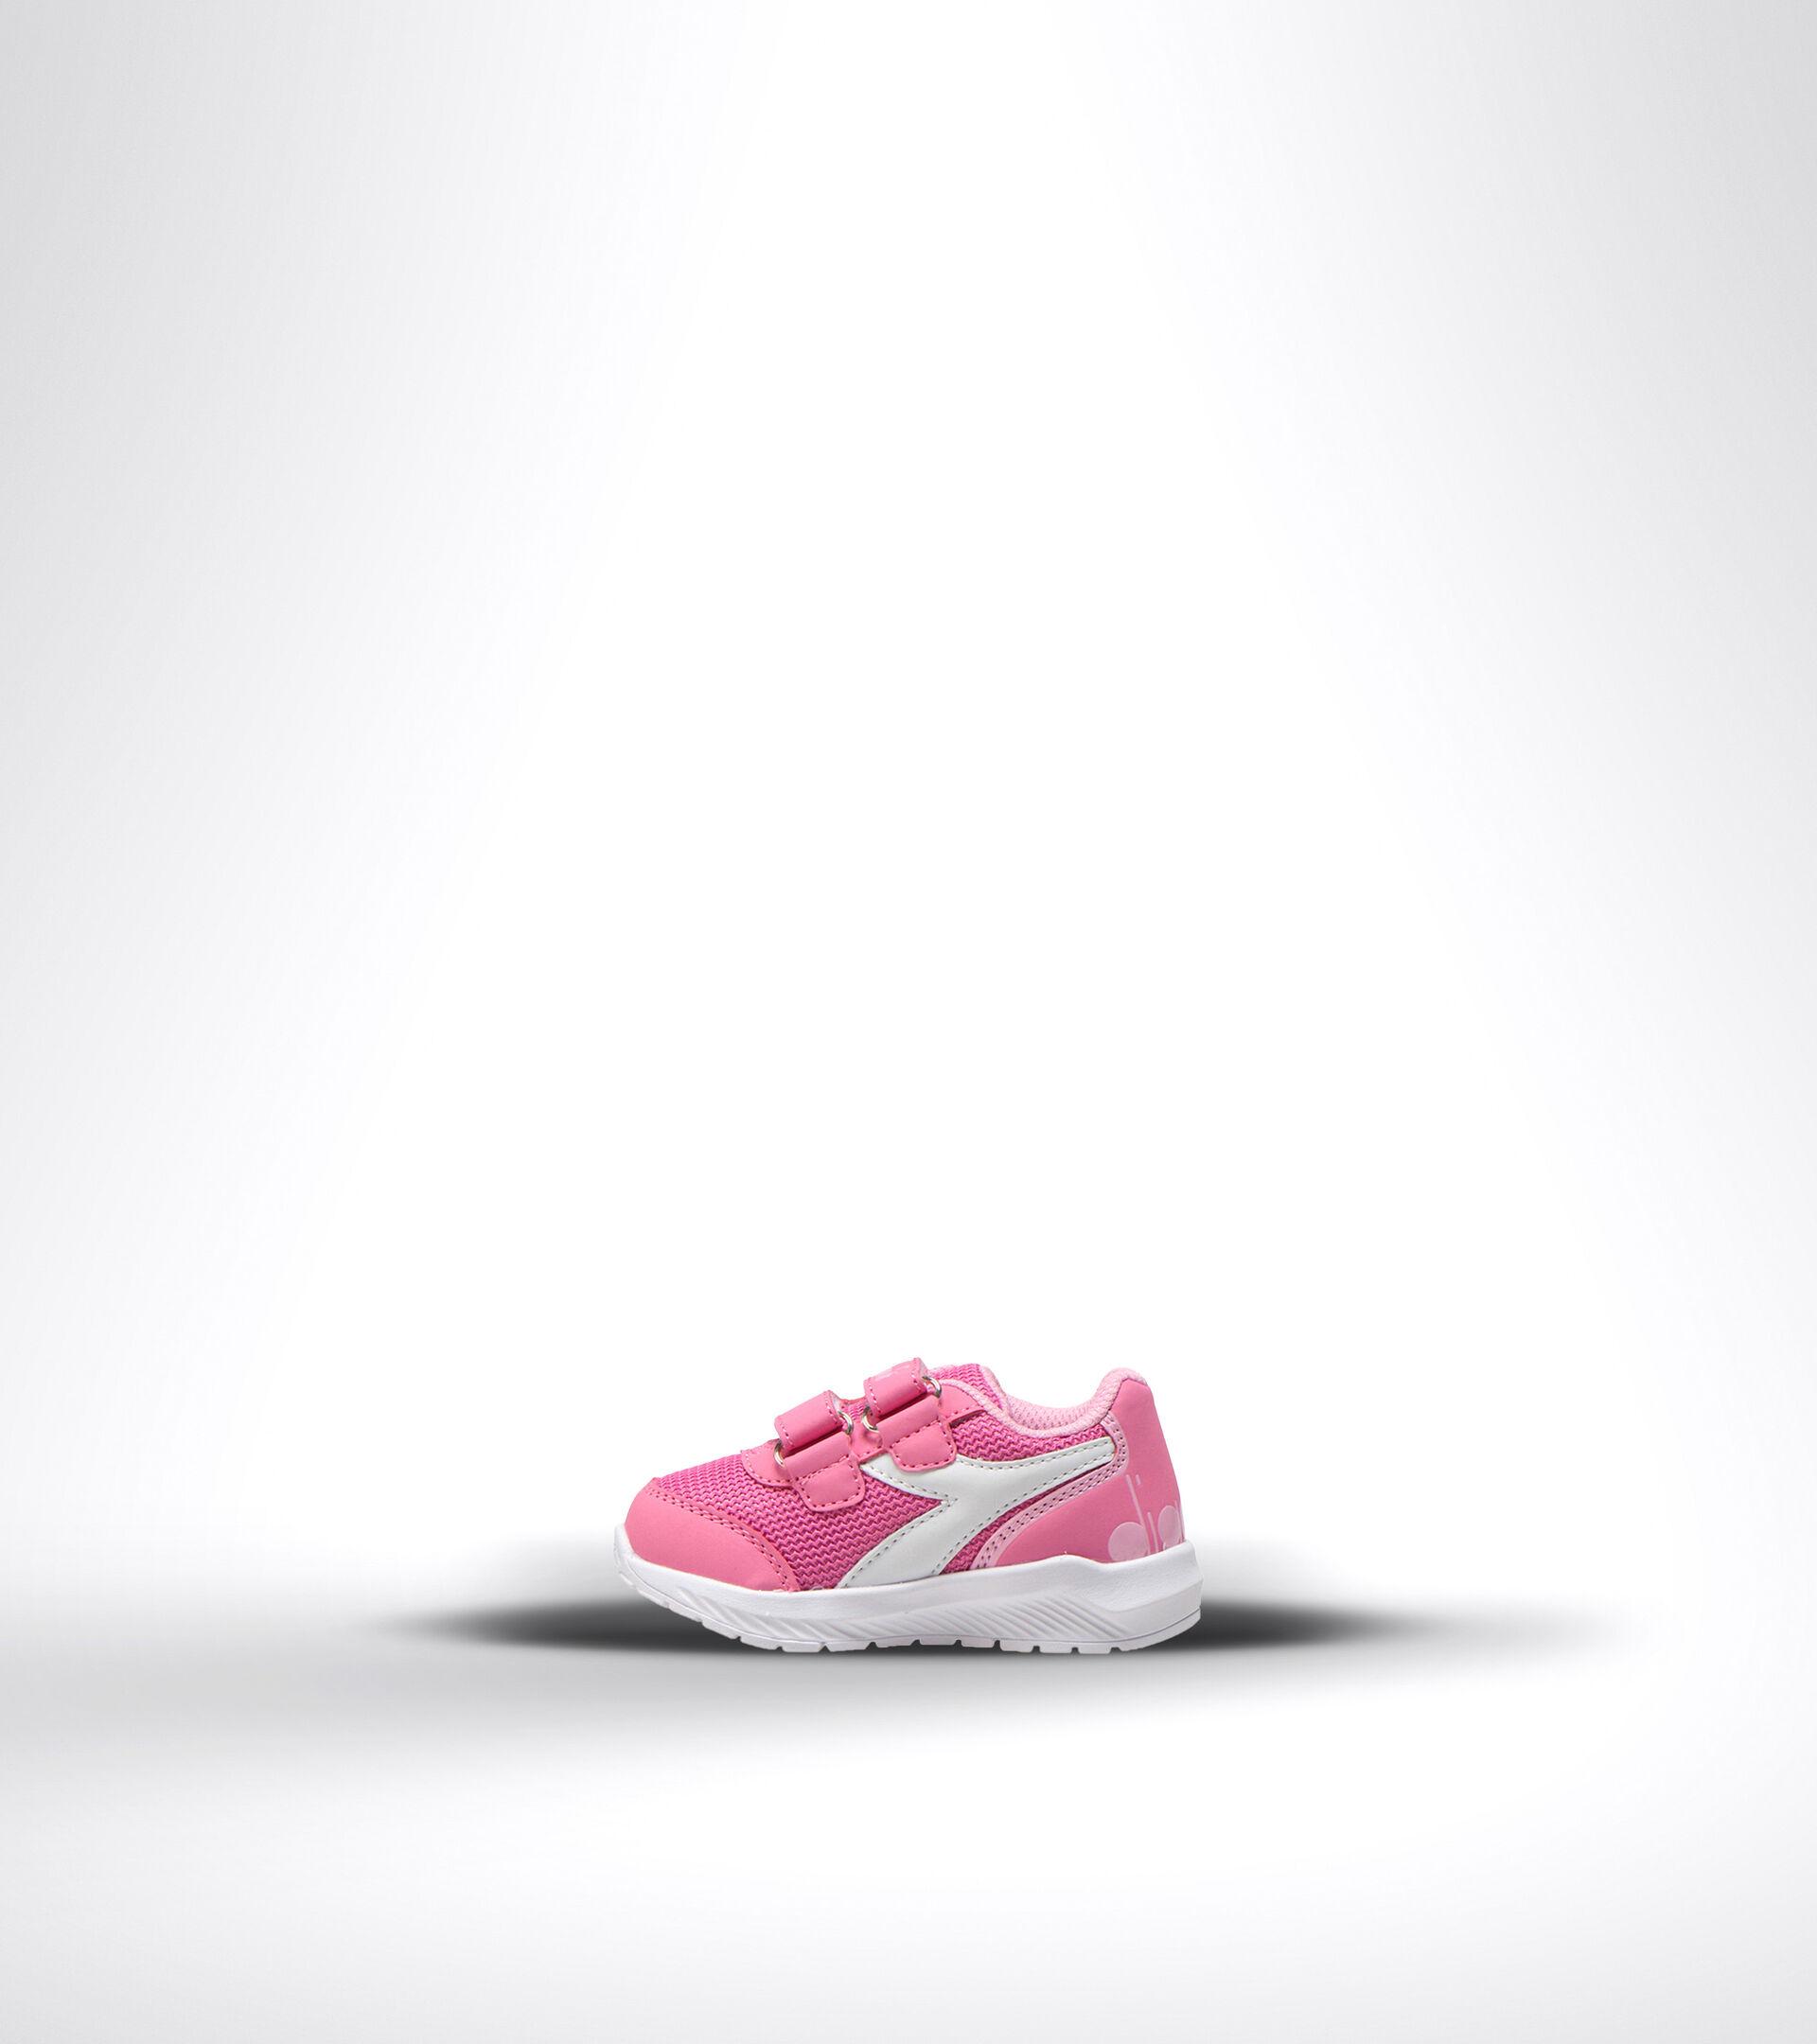 Chaussures de running - Unisexe enfant FALCON I ORCHIDEE SAUVAGE/LILAS SACHET - Diadora